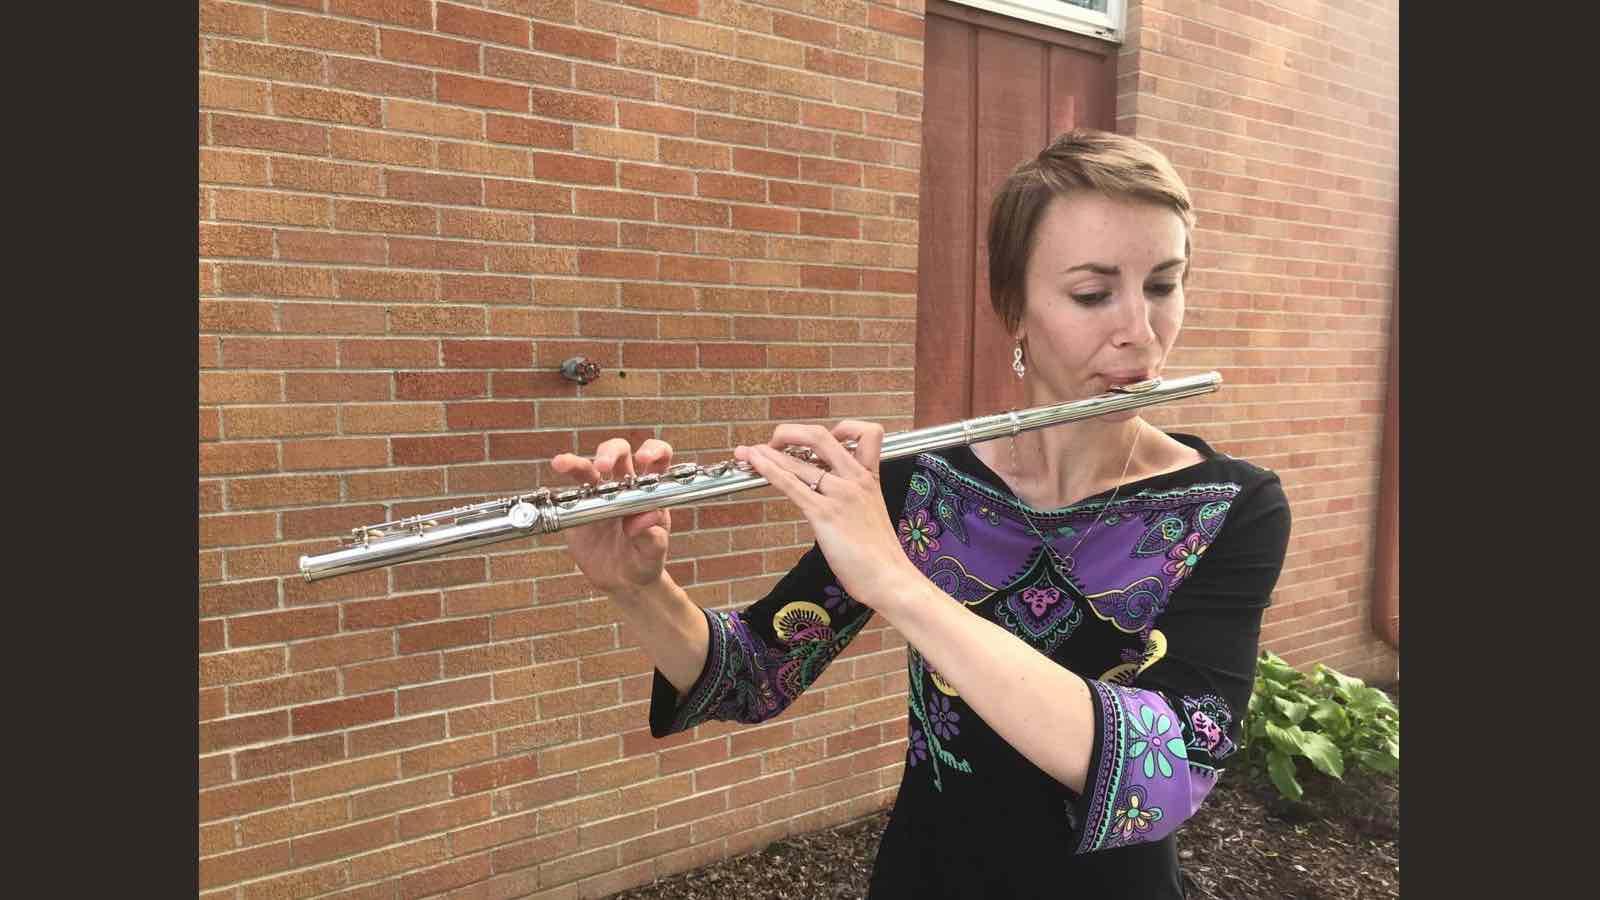 Natasha Hongsermeier-Graves playing the flute